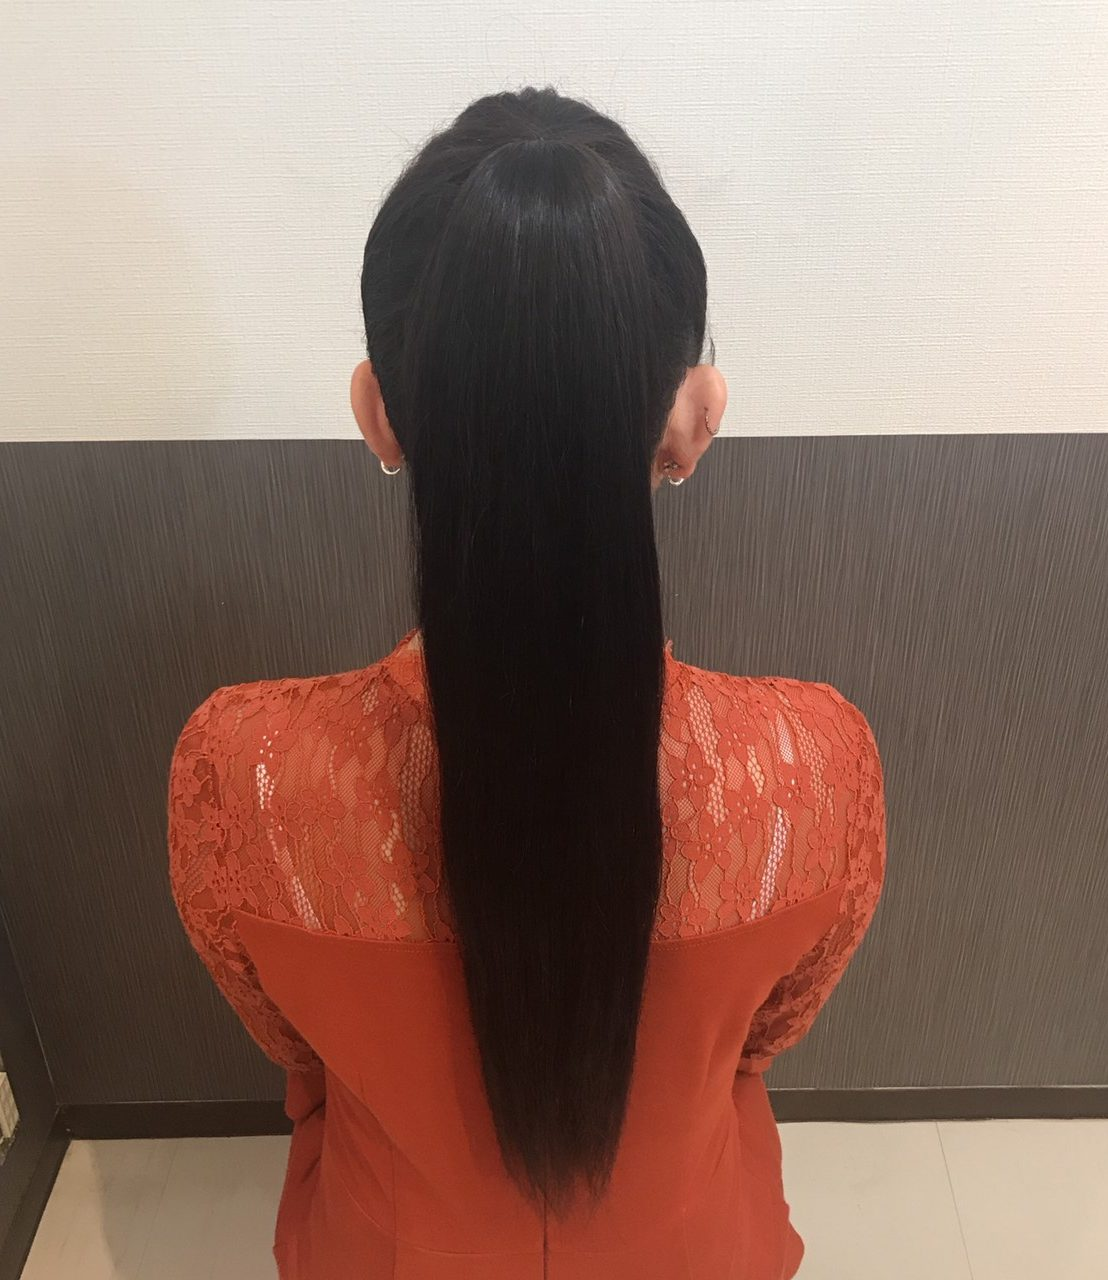 instagram,followme,like4like,お洒落さんと繋がりたい,キャバクラ派遣 #中洲バイト